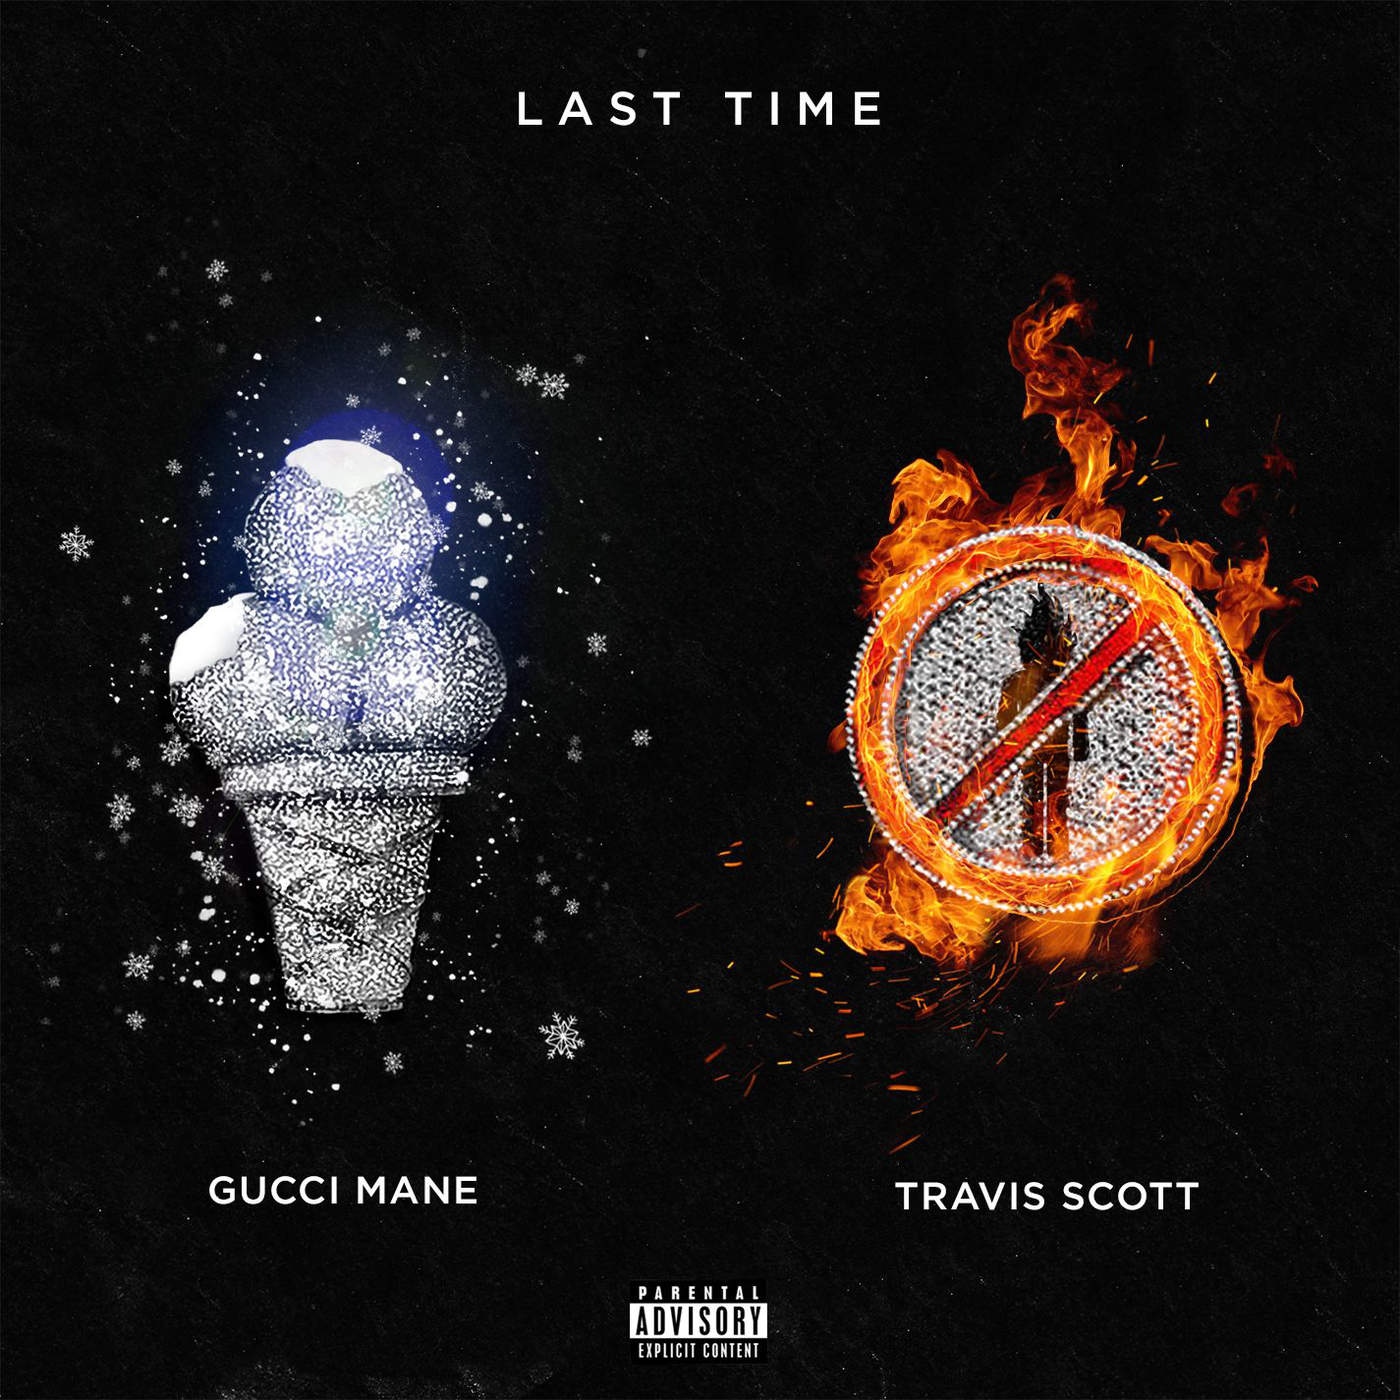 Gucci Mane - Last Time (feat. Travis Scott) - Single Cover